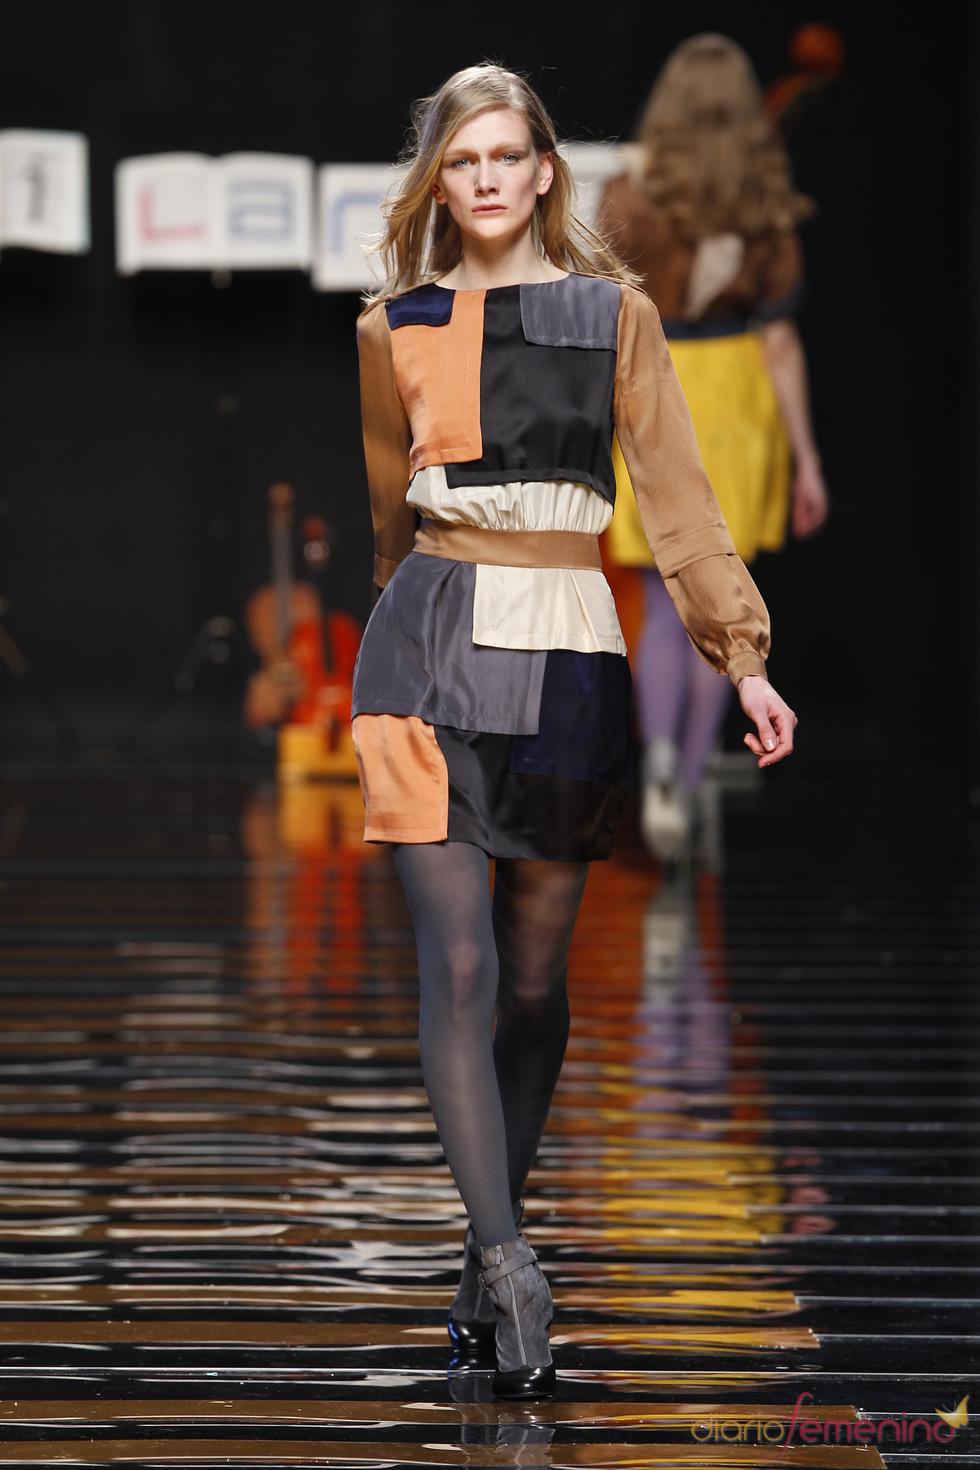 Desfile de Ailanto en la Semana de la Moda de Madrid 2010